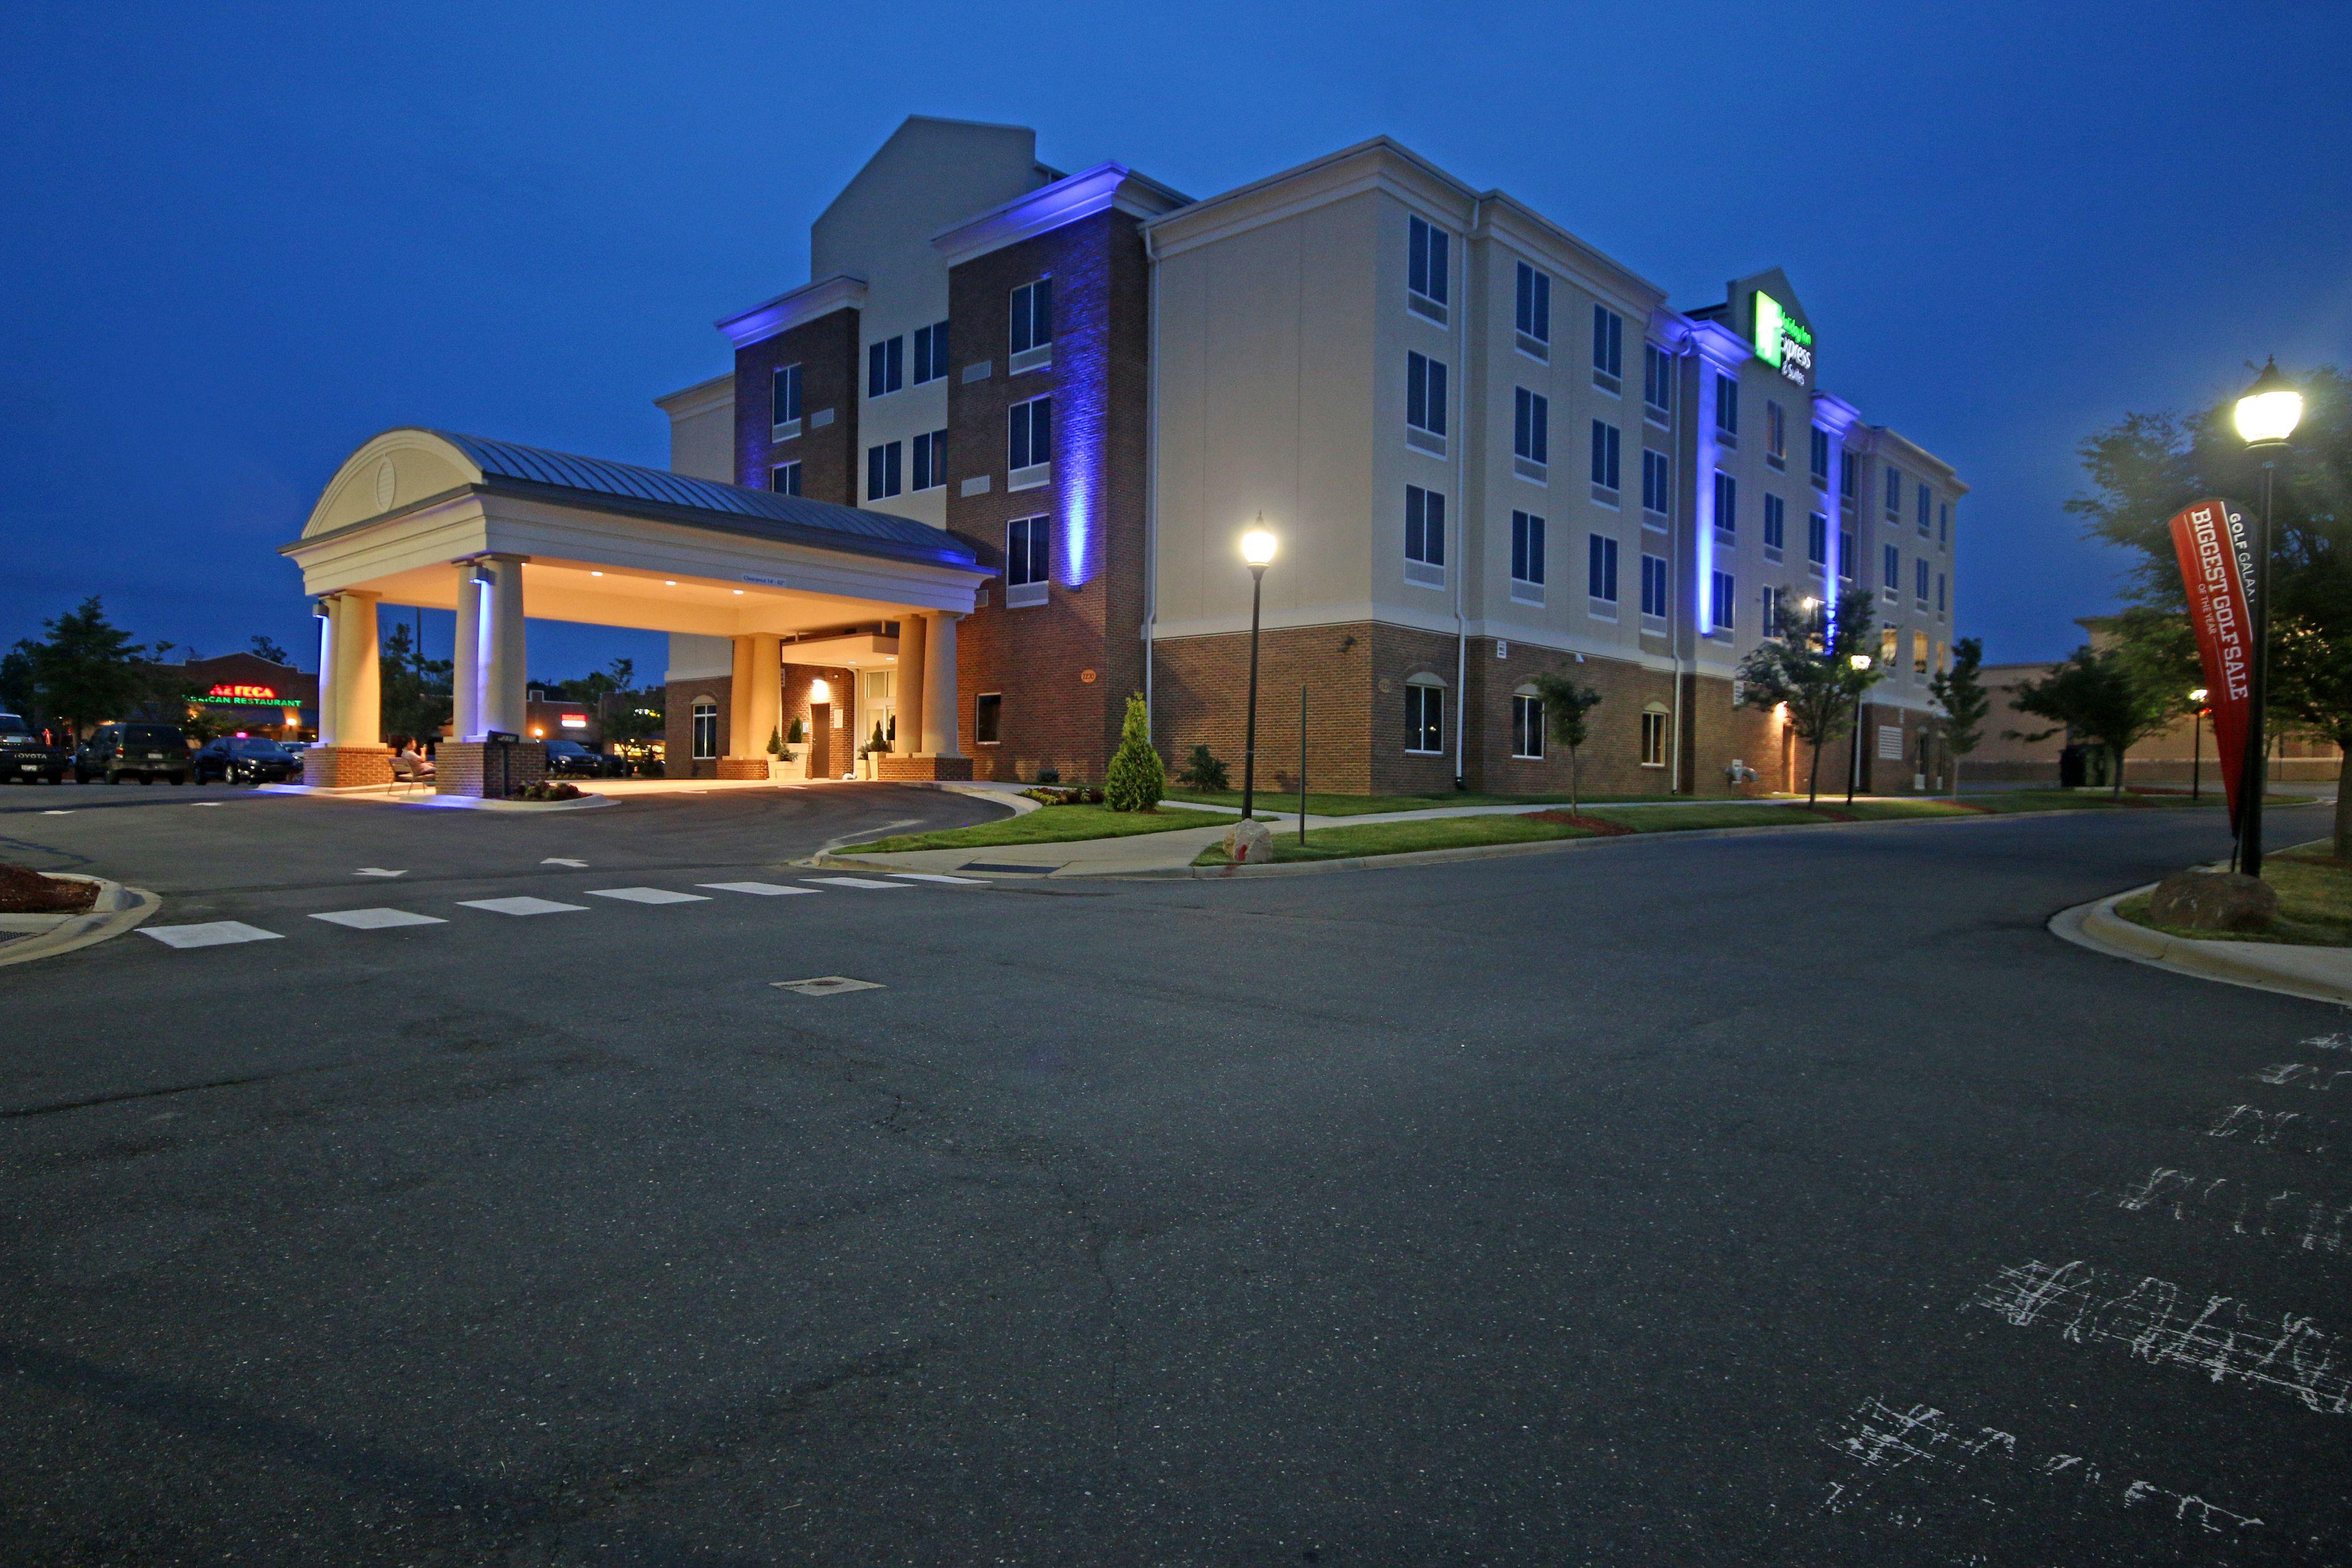 Holiday Inn Express & Suites Charlotte Arpt-Belmont image 5